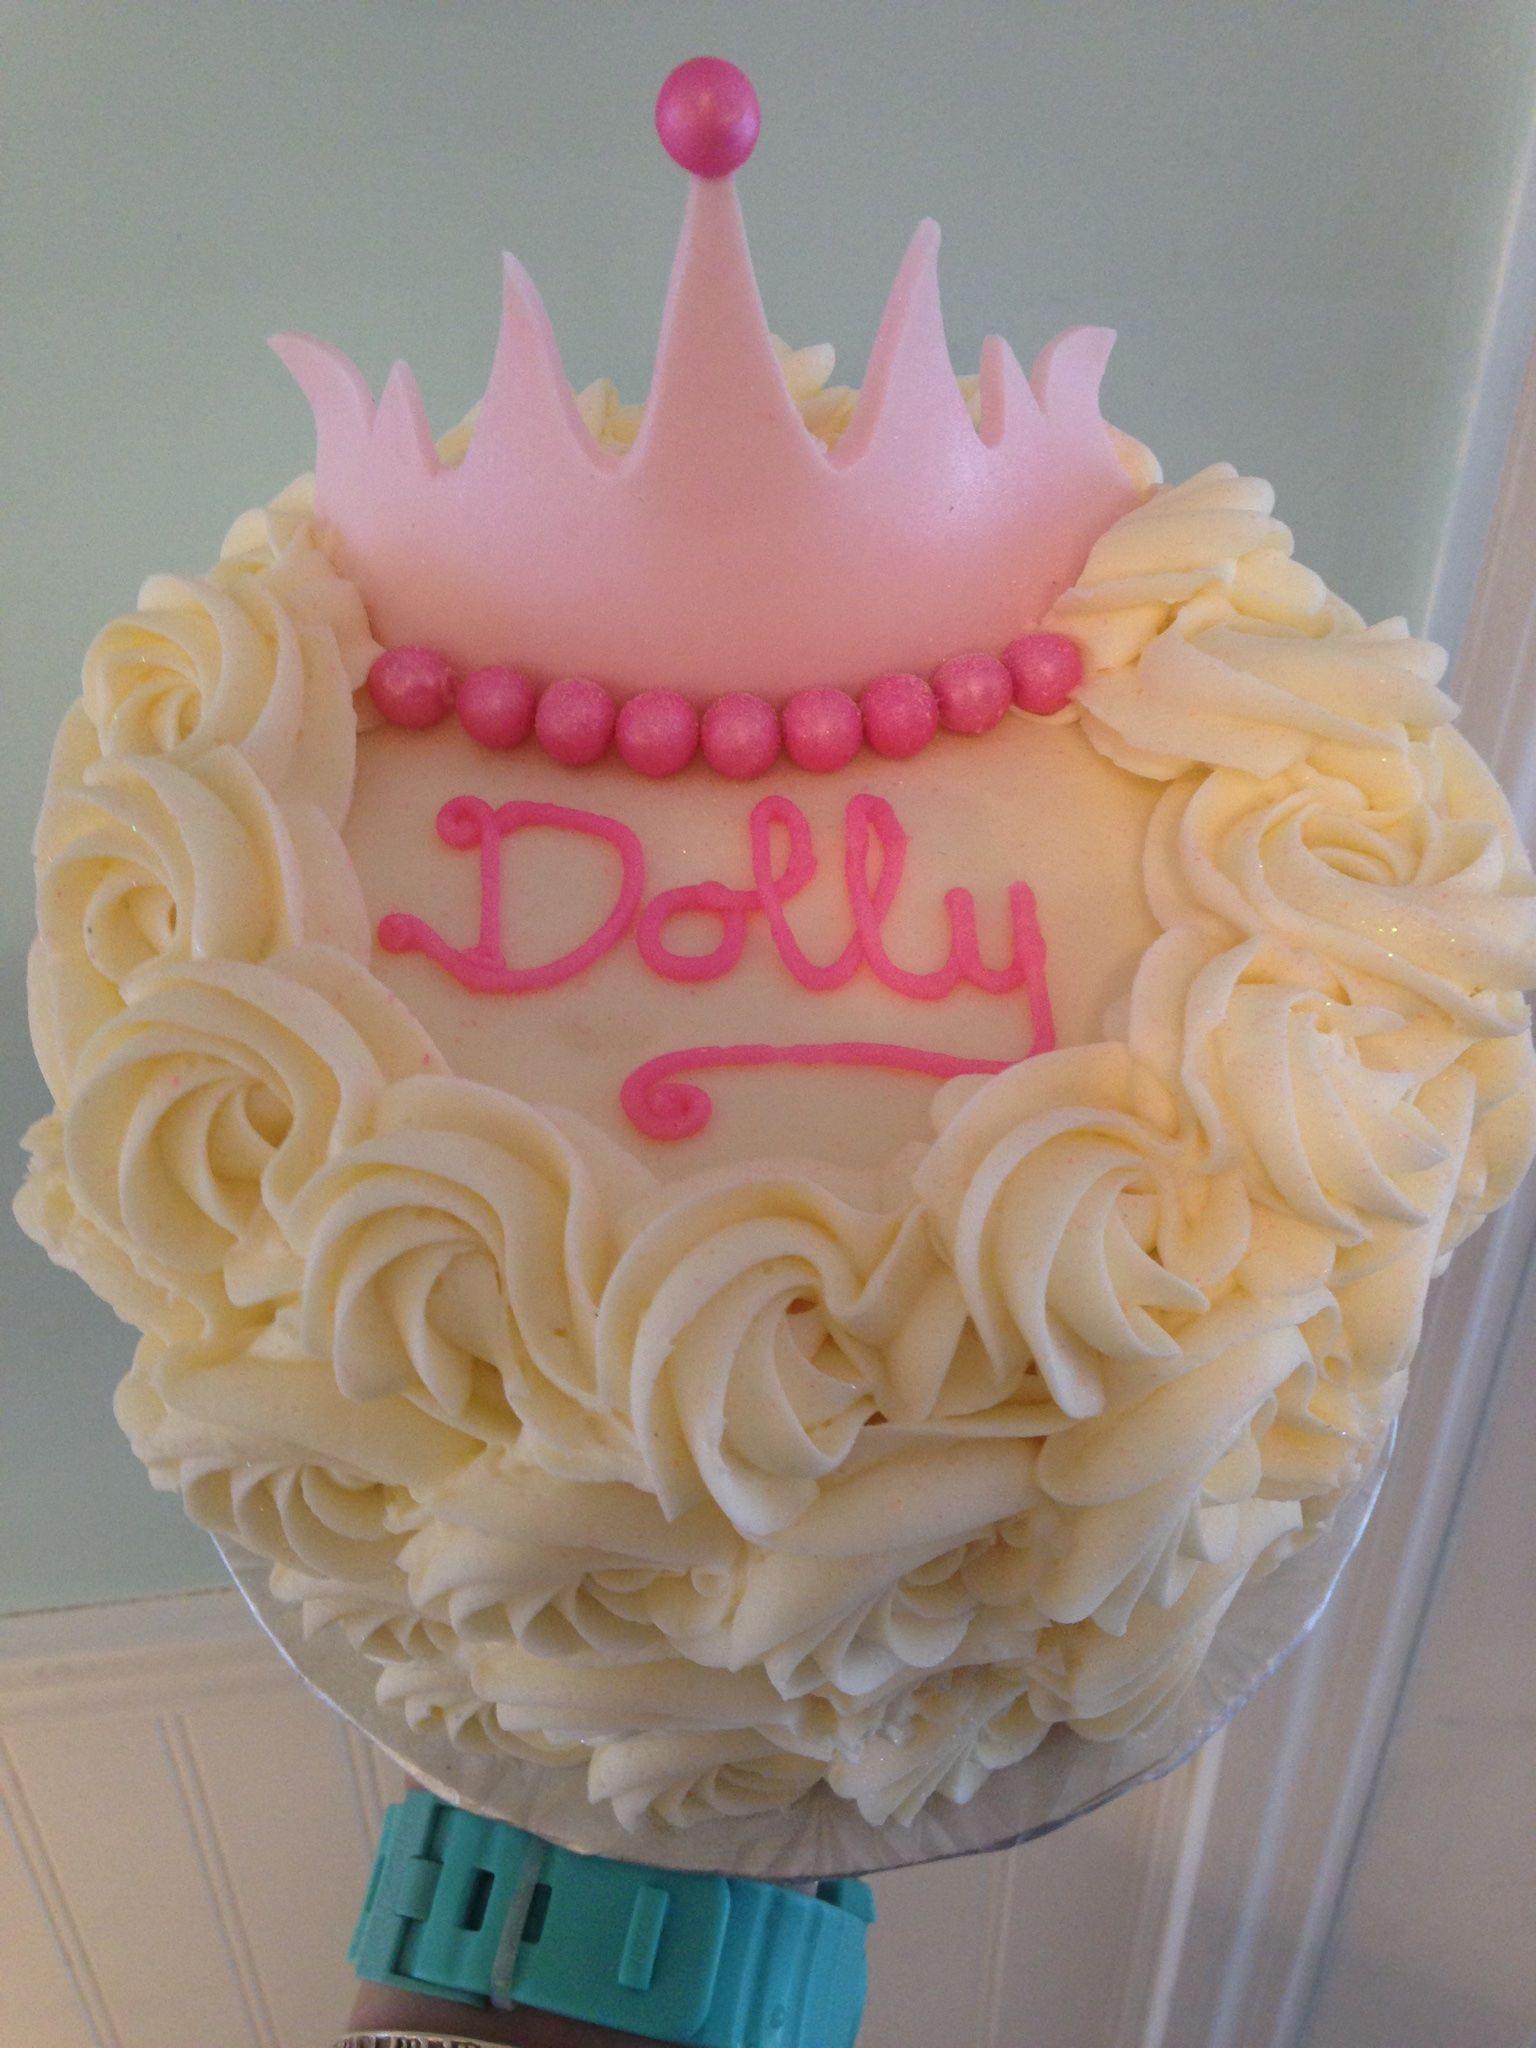 Princess Tiara Birthday Cake From Sweet Savannahs In Marathon